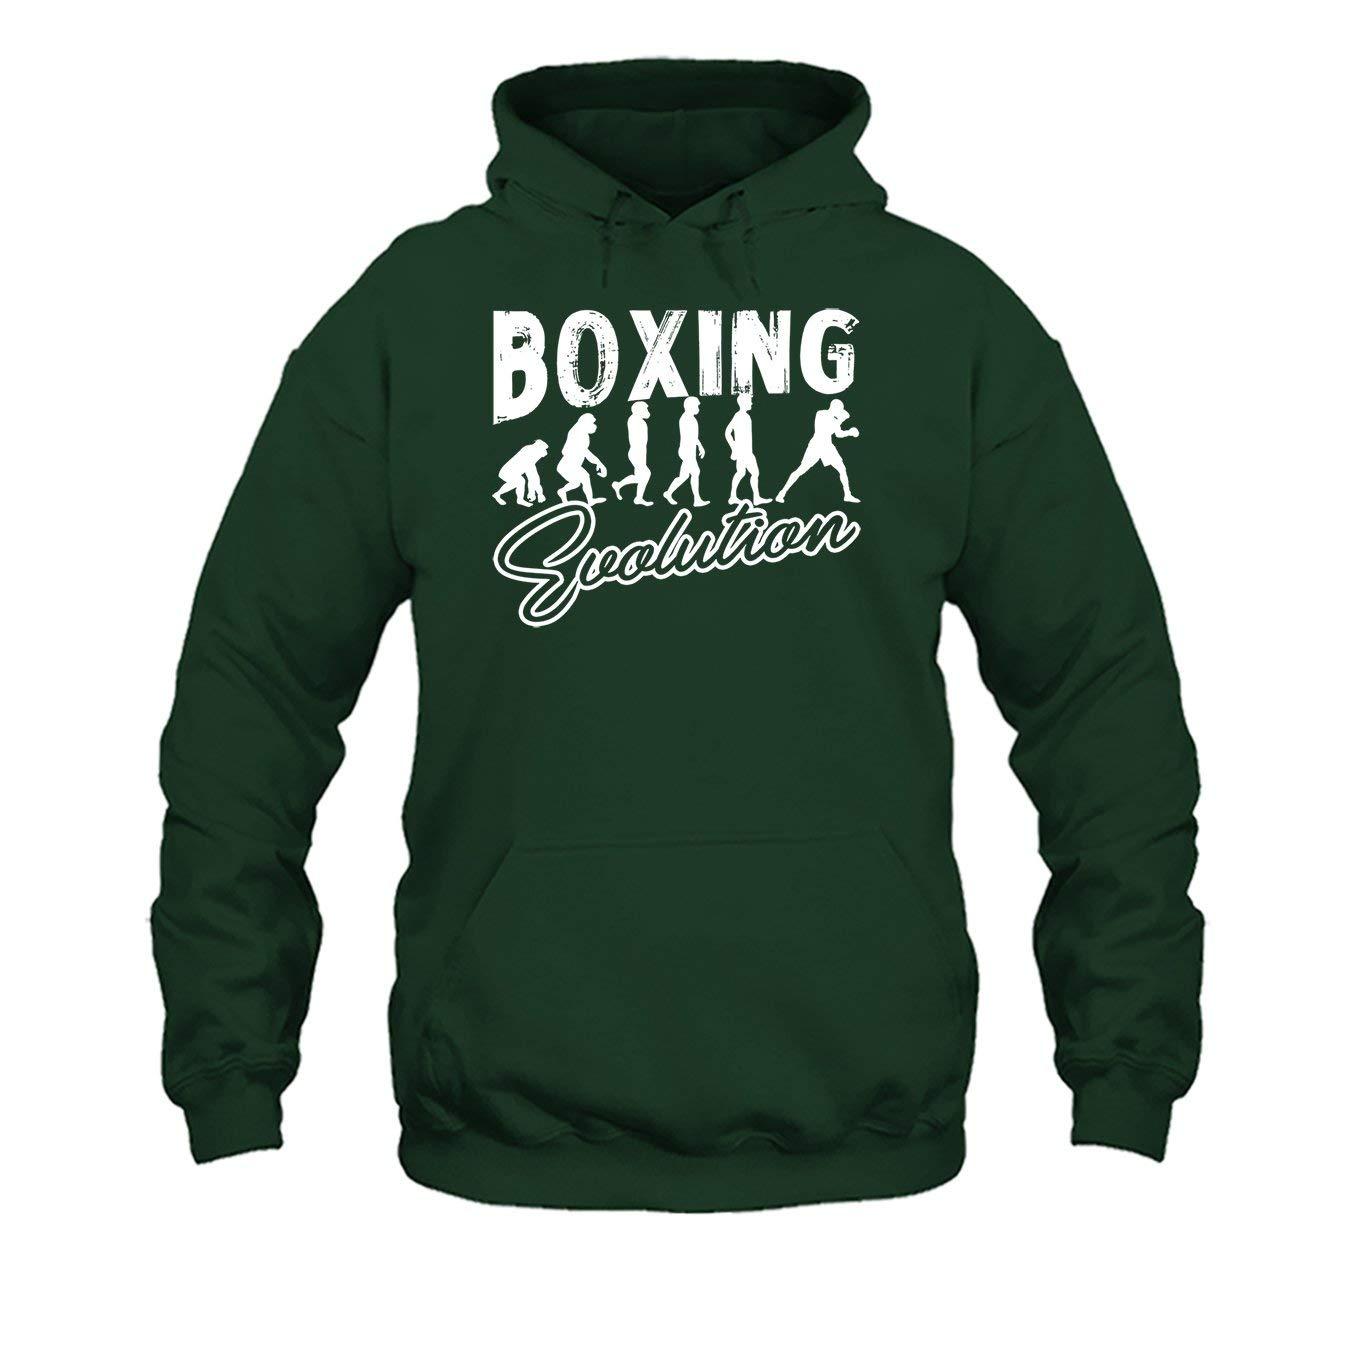 Sheep Fly Boxing Evolution Tee Shirt Hoodie Sweatshirt